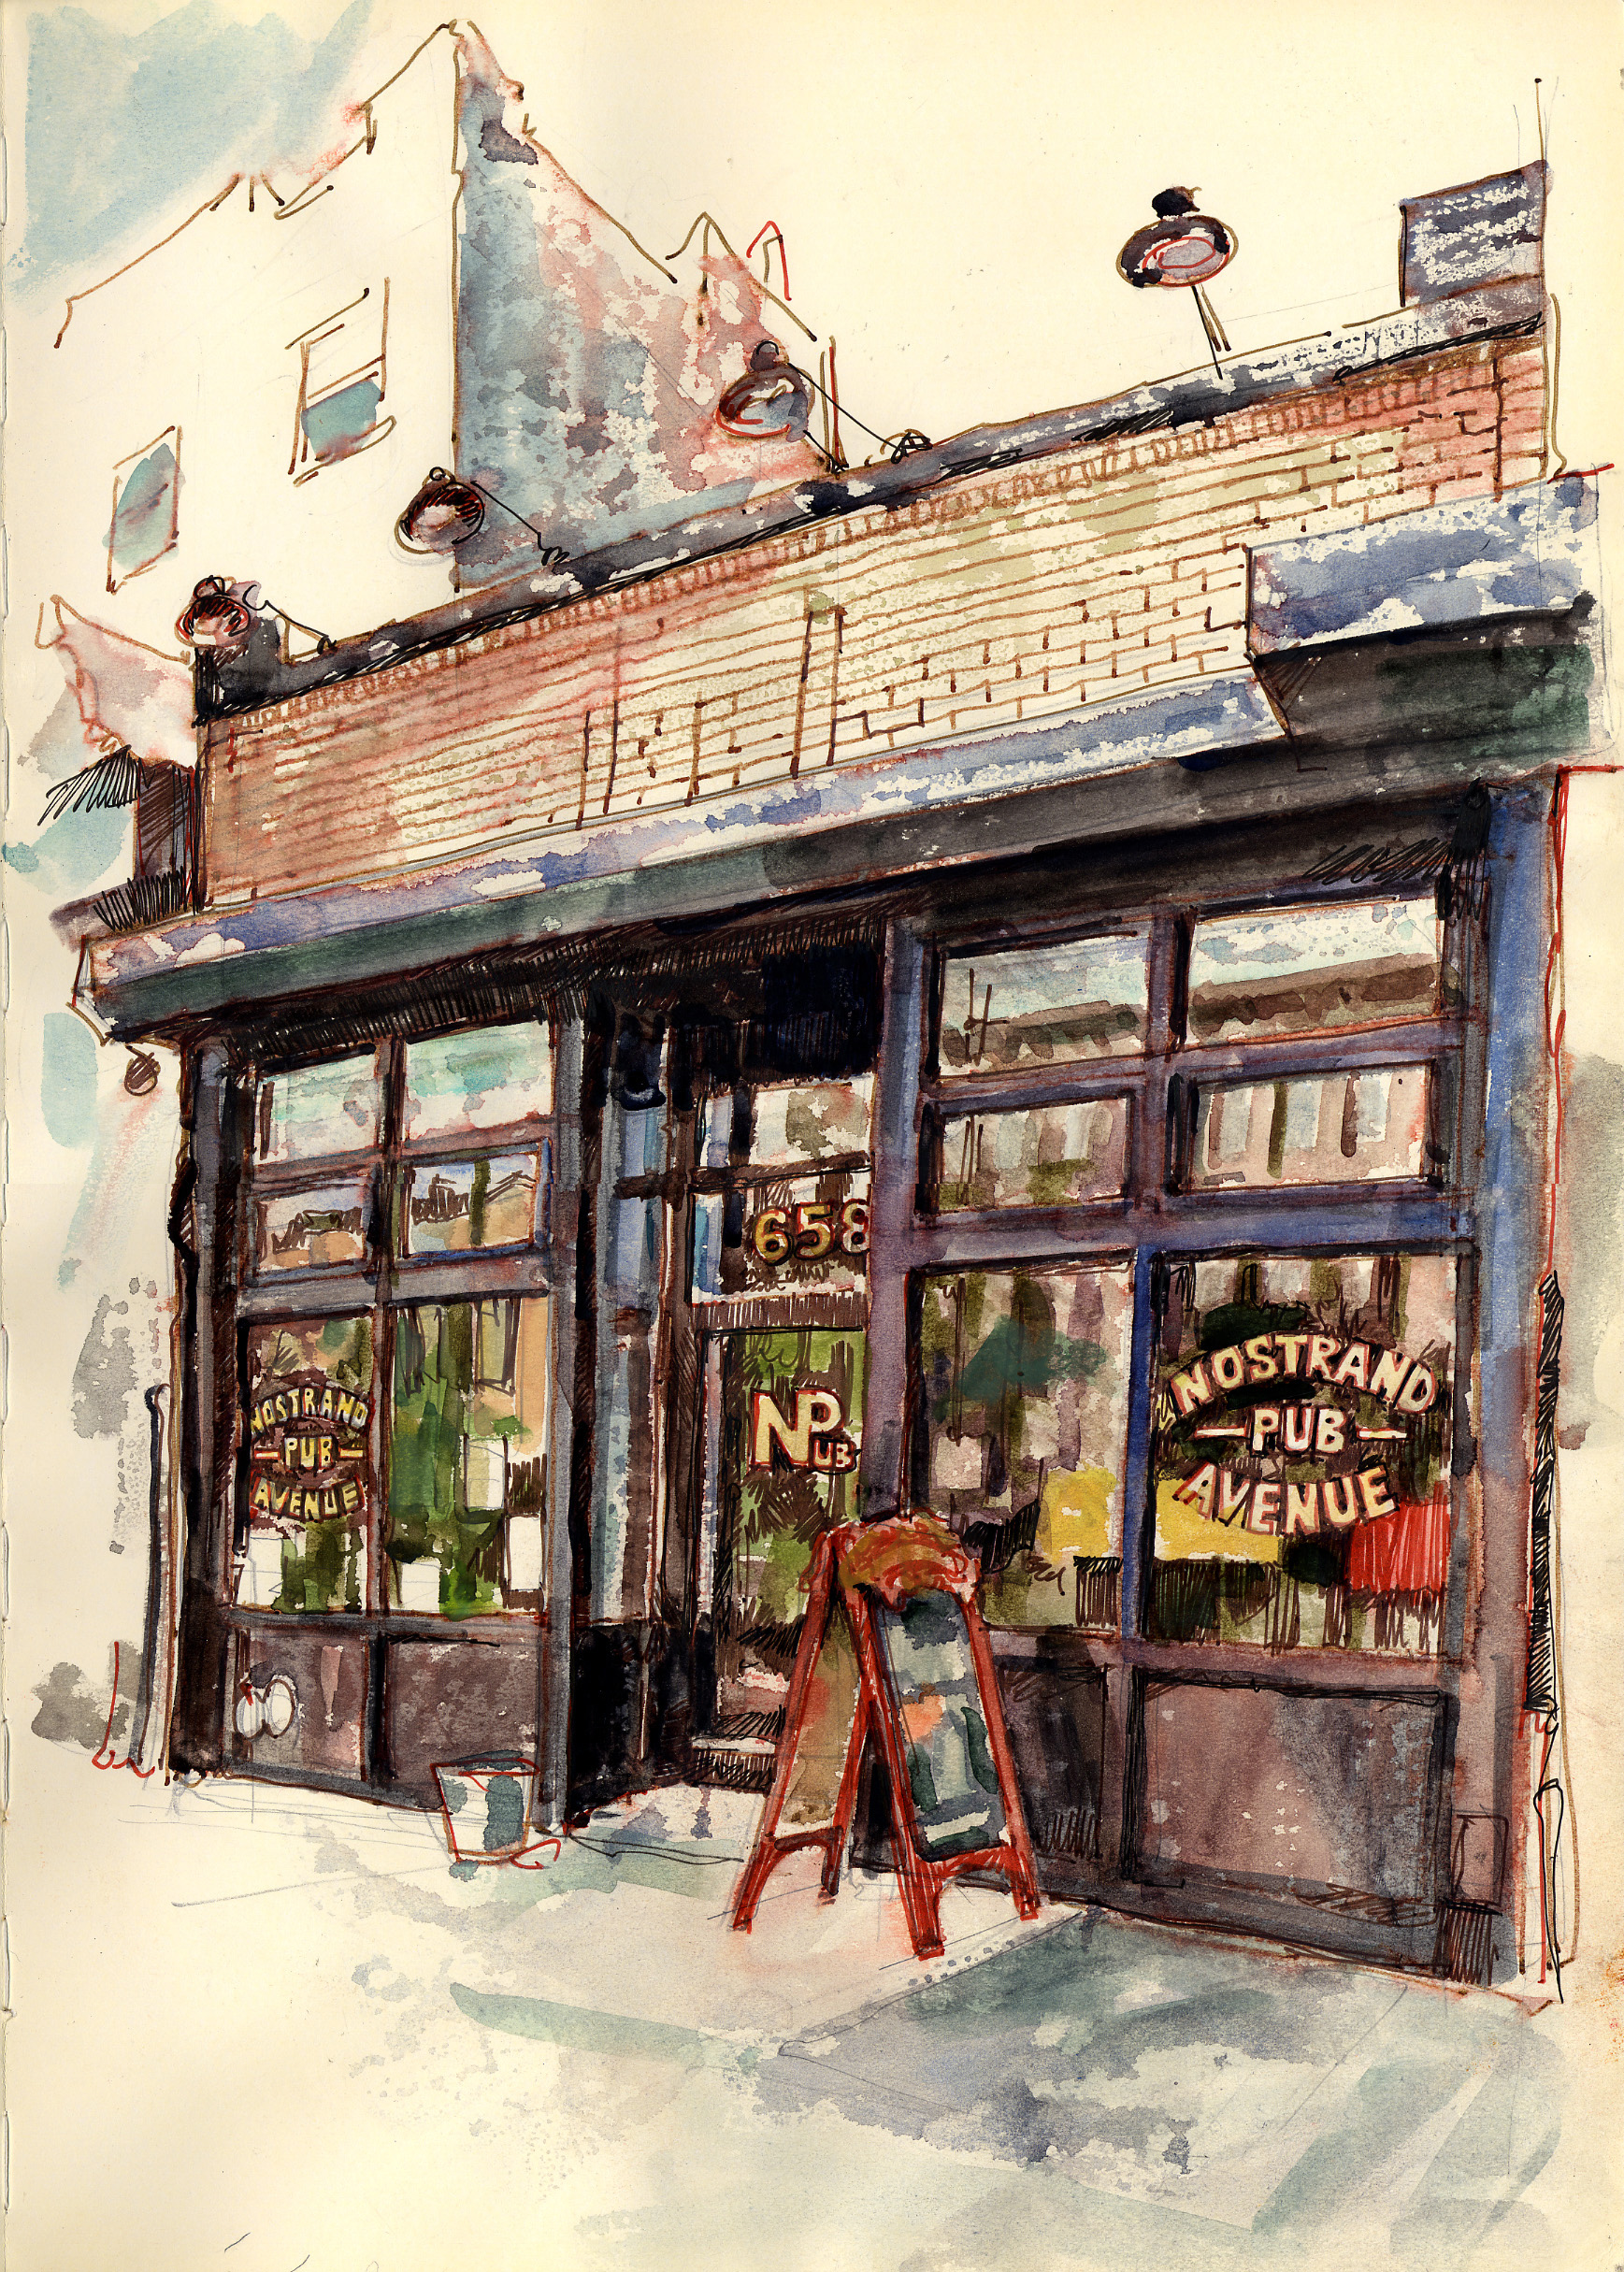 Nostrand Avenue Pub Stephen Gardner